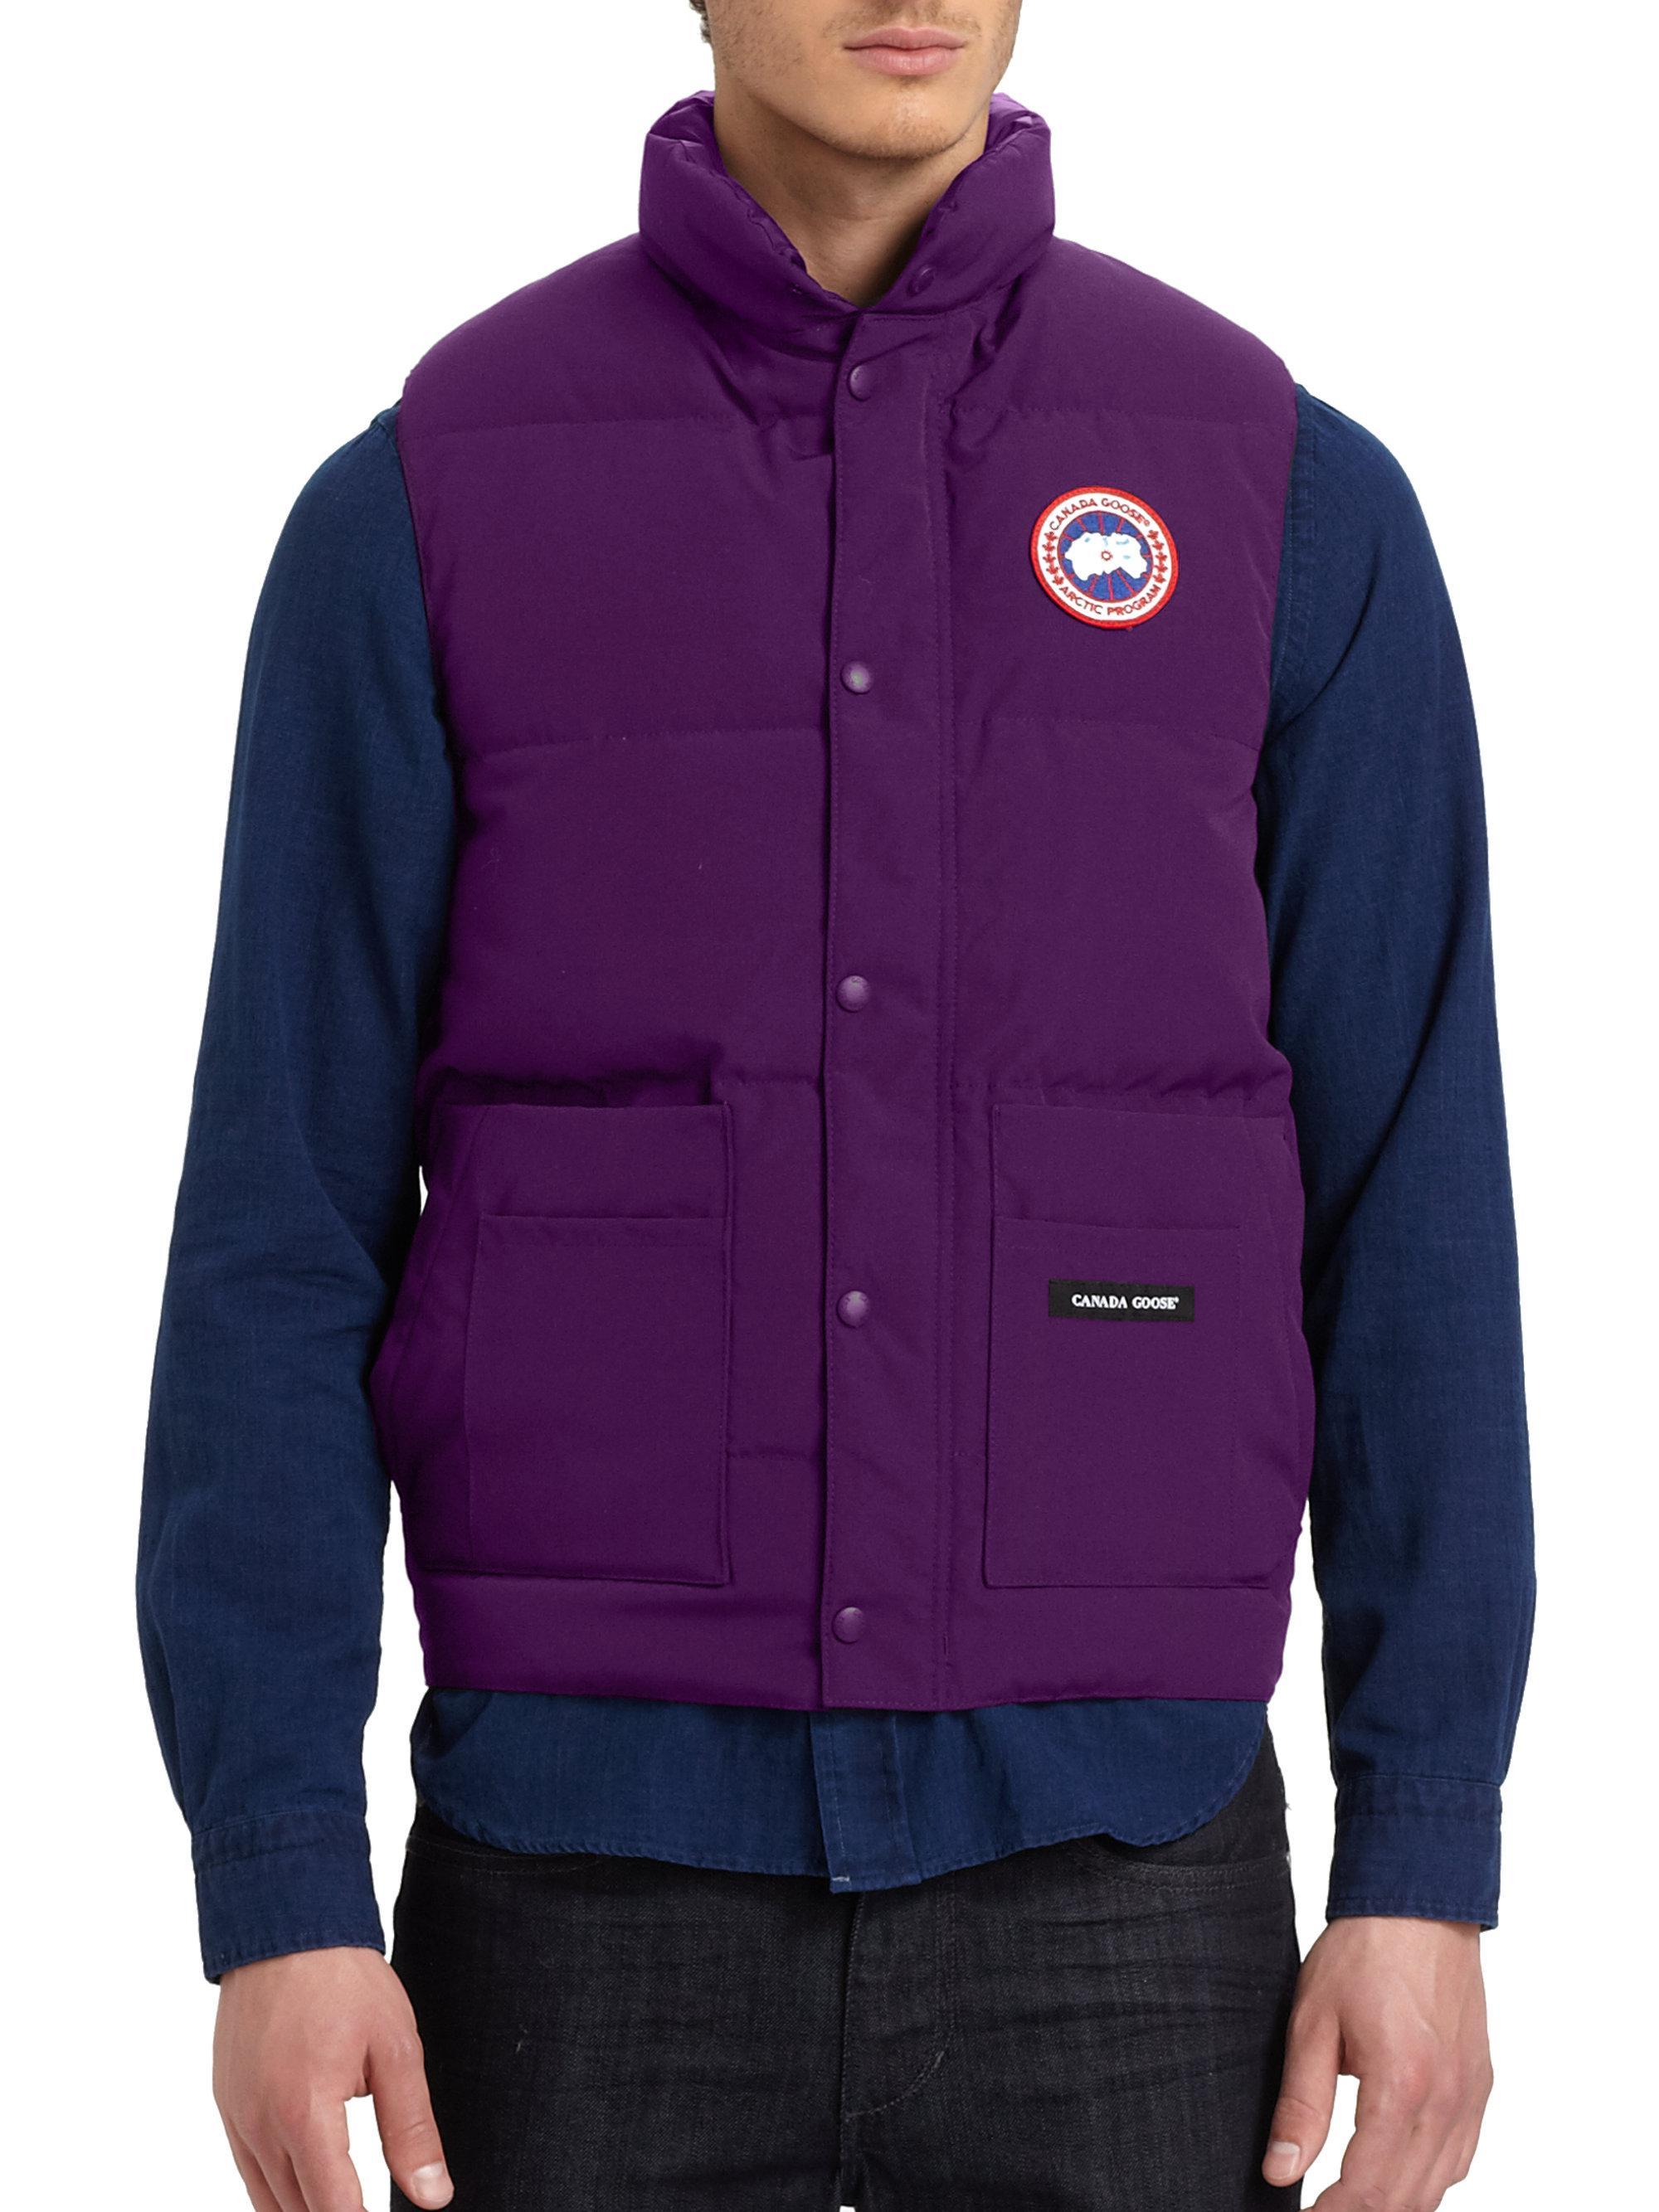 canada goose freestyle puffer vest in purple for men lyst rh lyst co uk